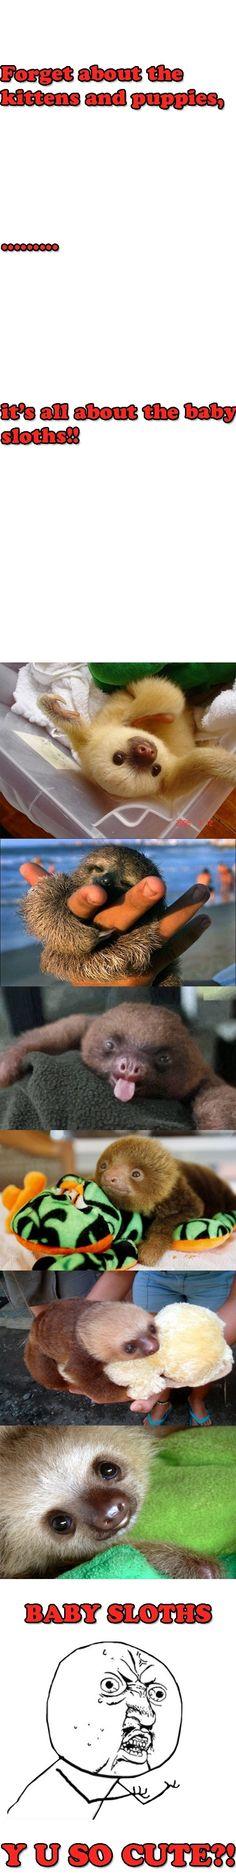 baby sloth...